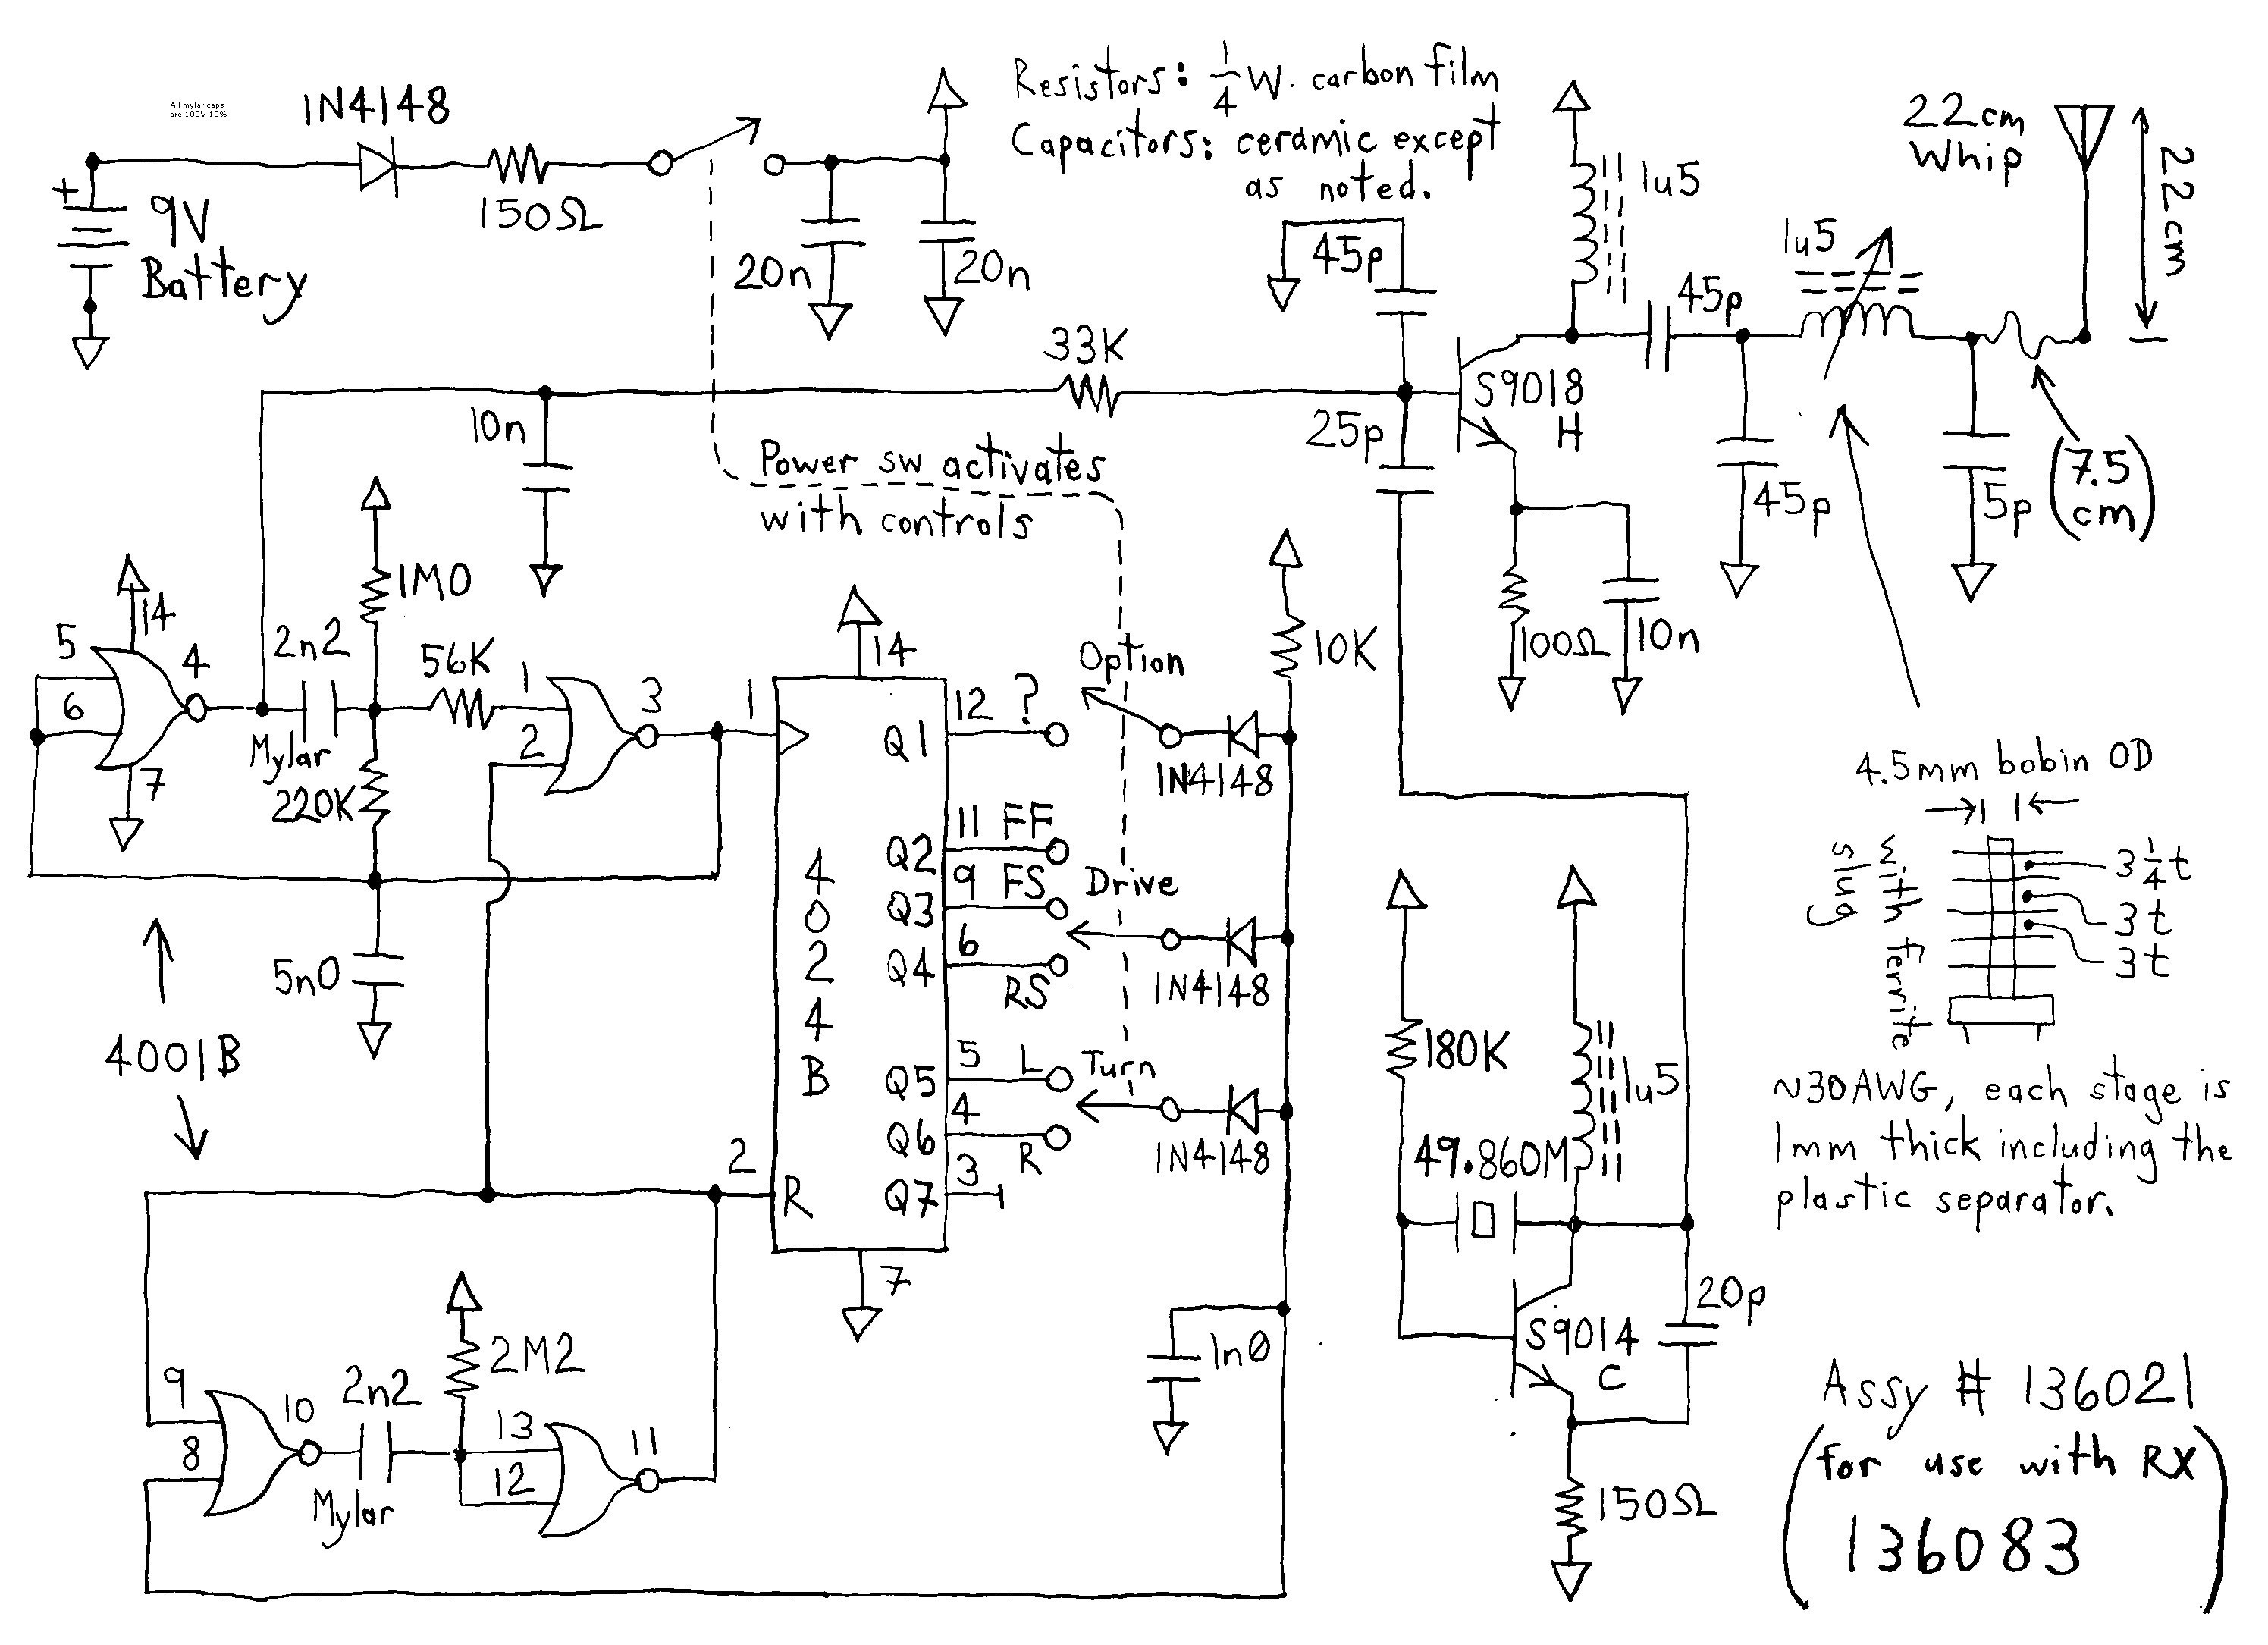 2 Post Car Lift Wiring Diagram Wiring Diagram Today 2 Post Car Lift Wiring Diagram